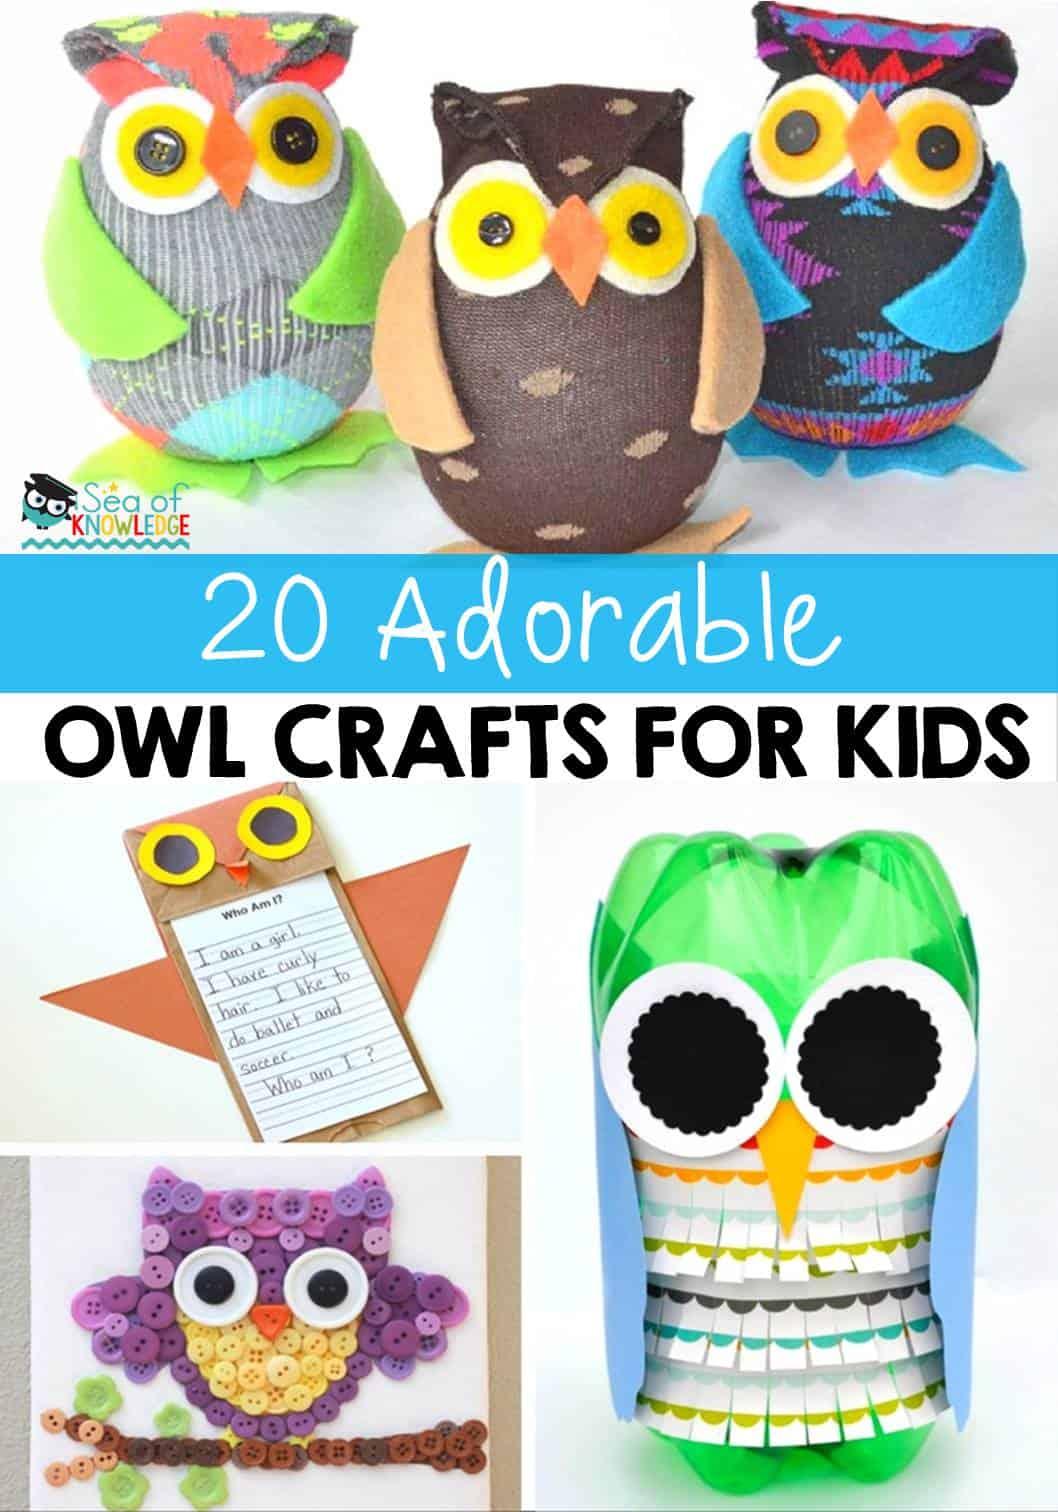 20 Adorable Owl Crafts For Kids